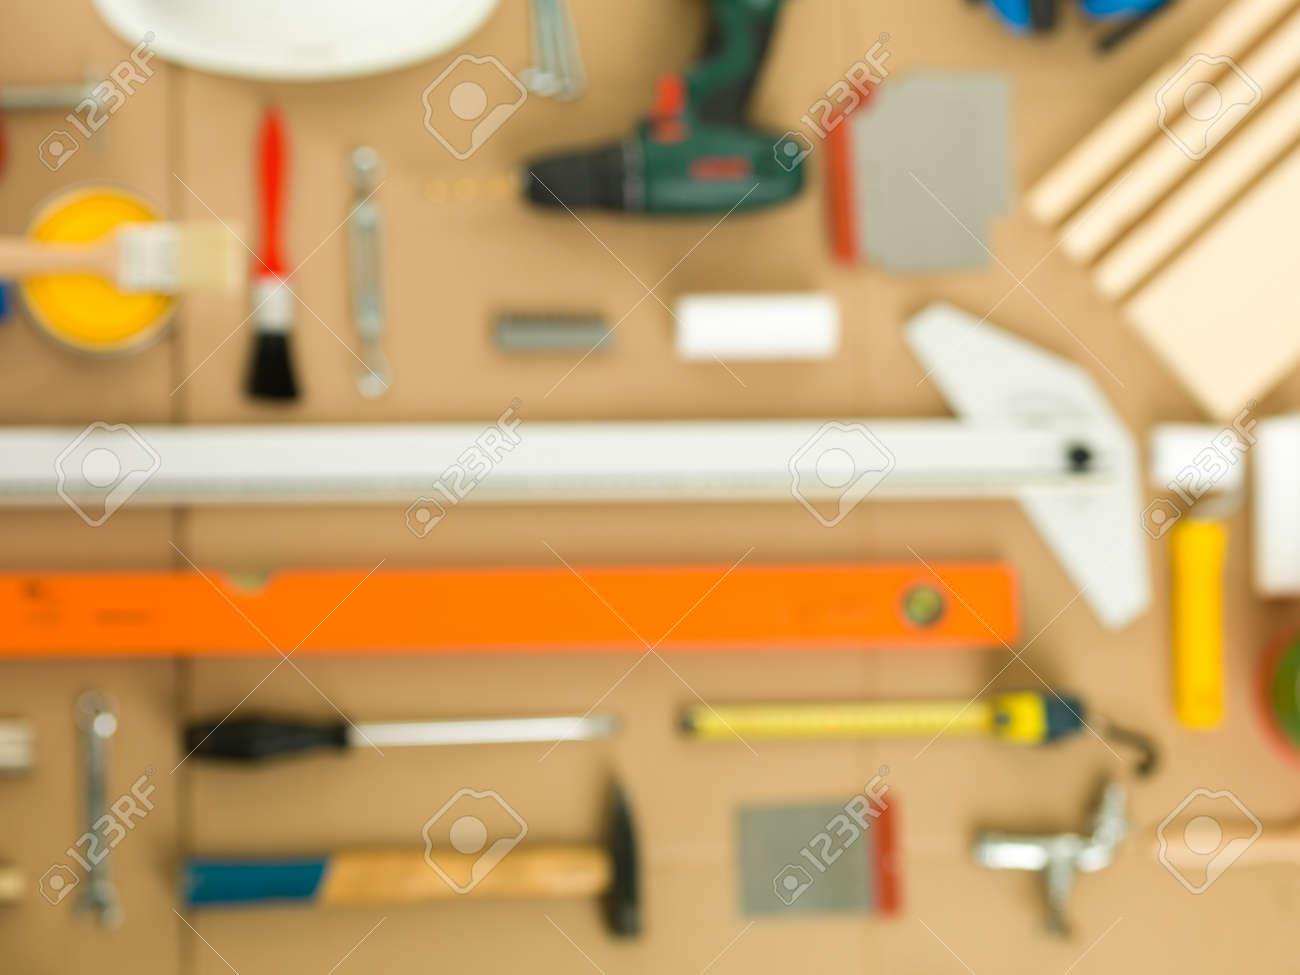 background blur DIY work tools